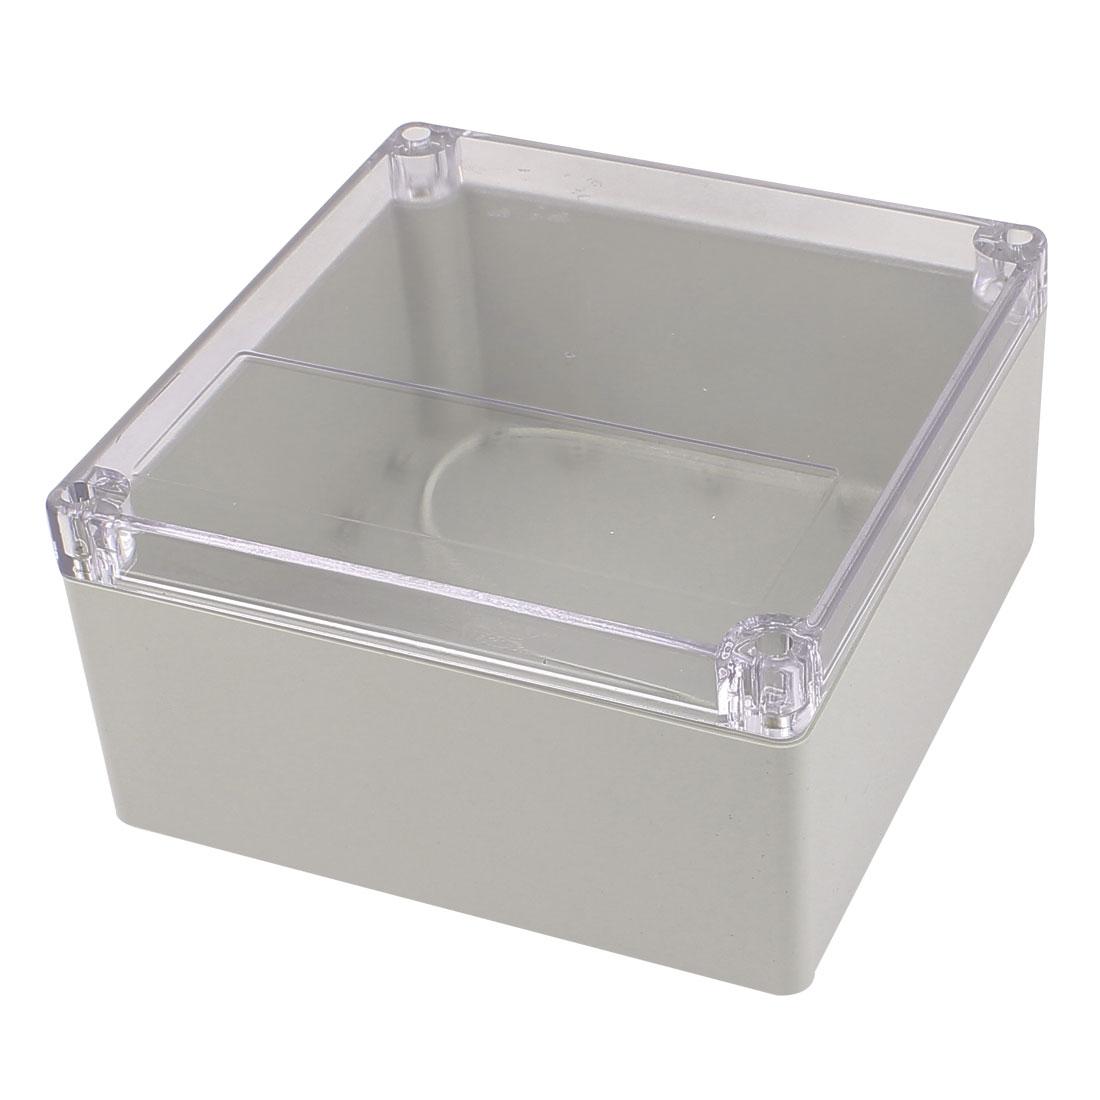 192mm x 188mm x 100mm Clear Cover Dustproof IP65 Enclosure Case DIY Junction Box